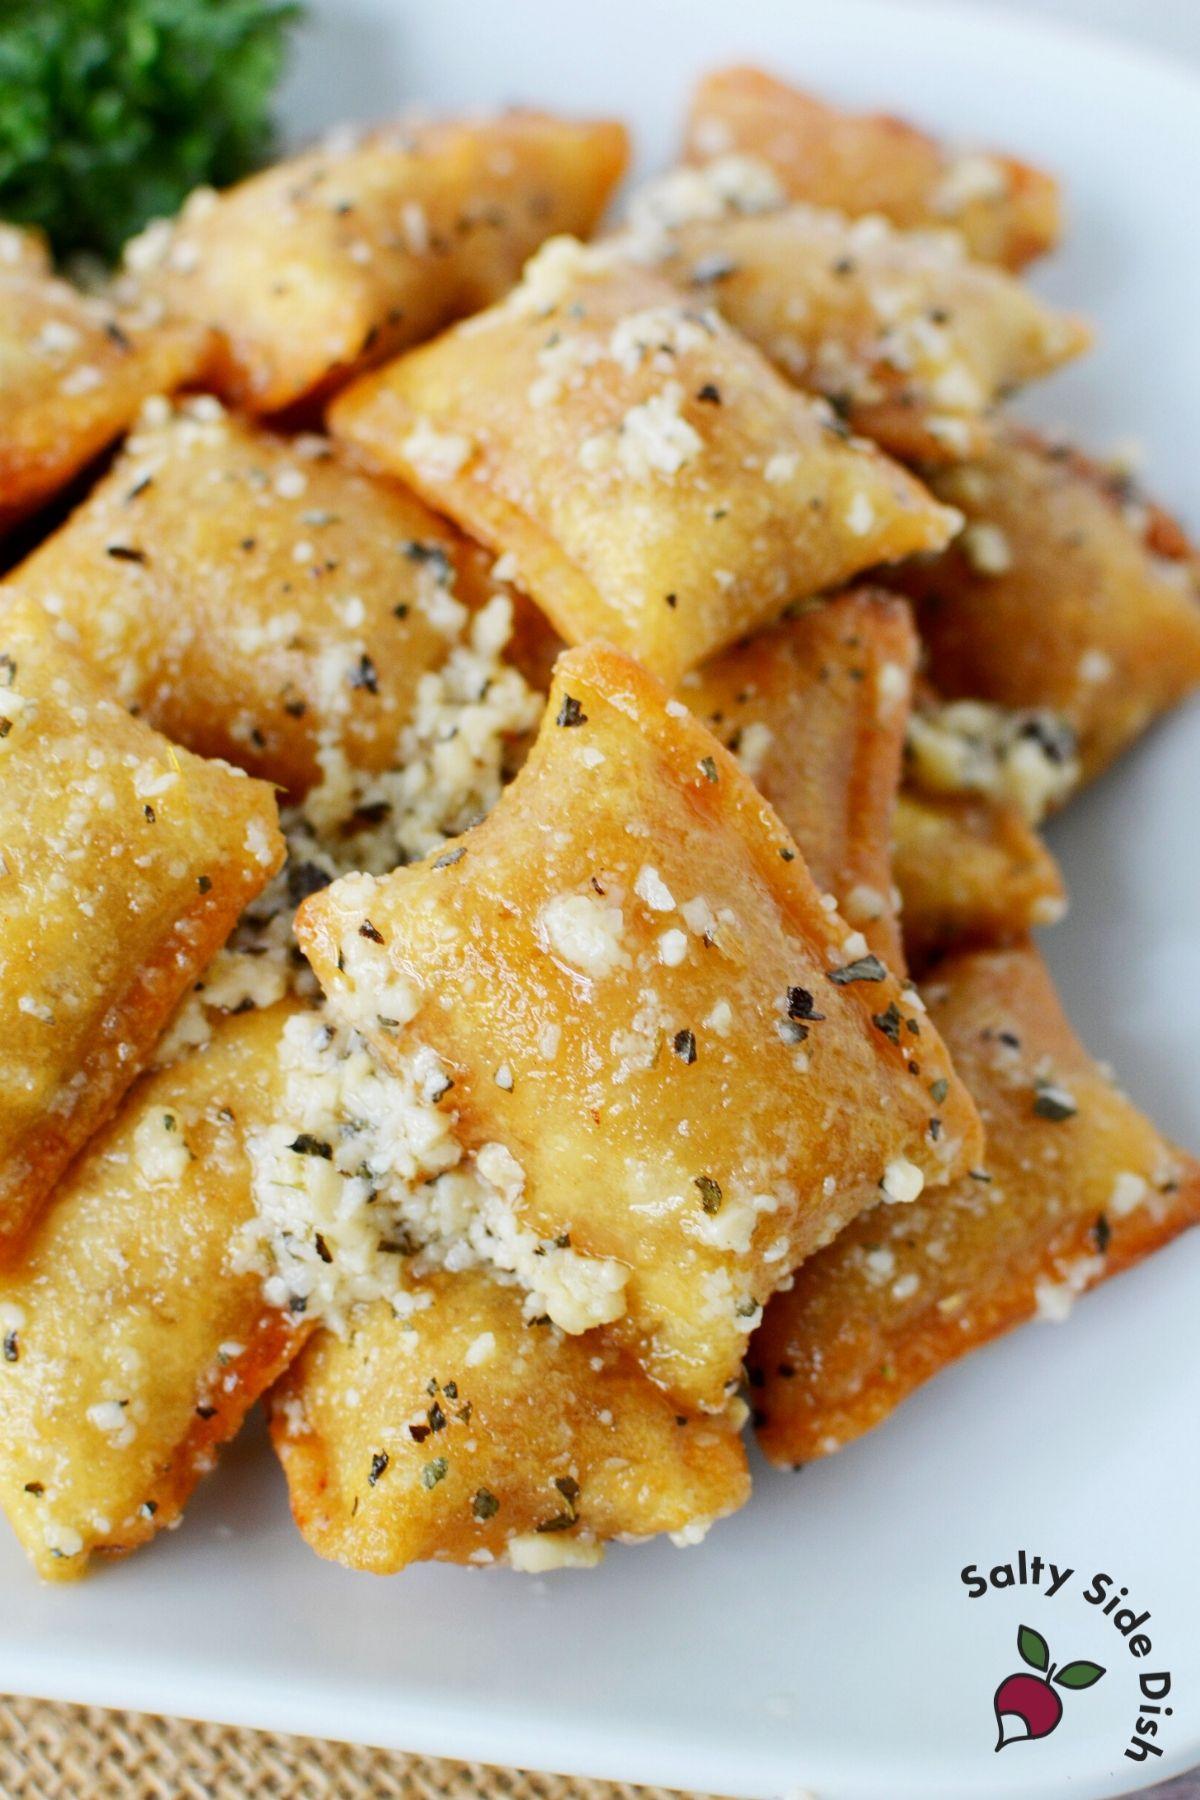 tiktok totino's pizza rolls recipe on a plate